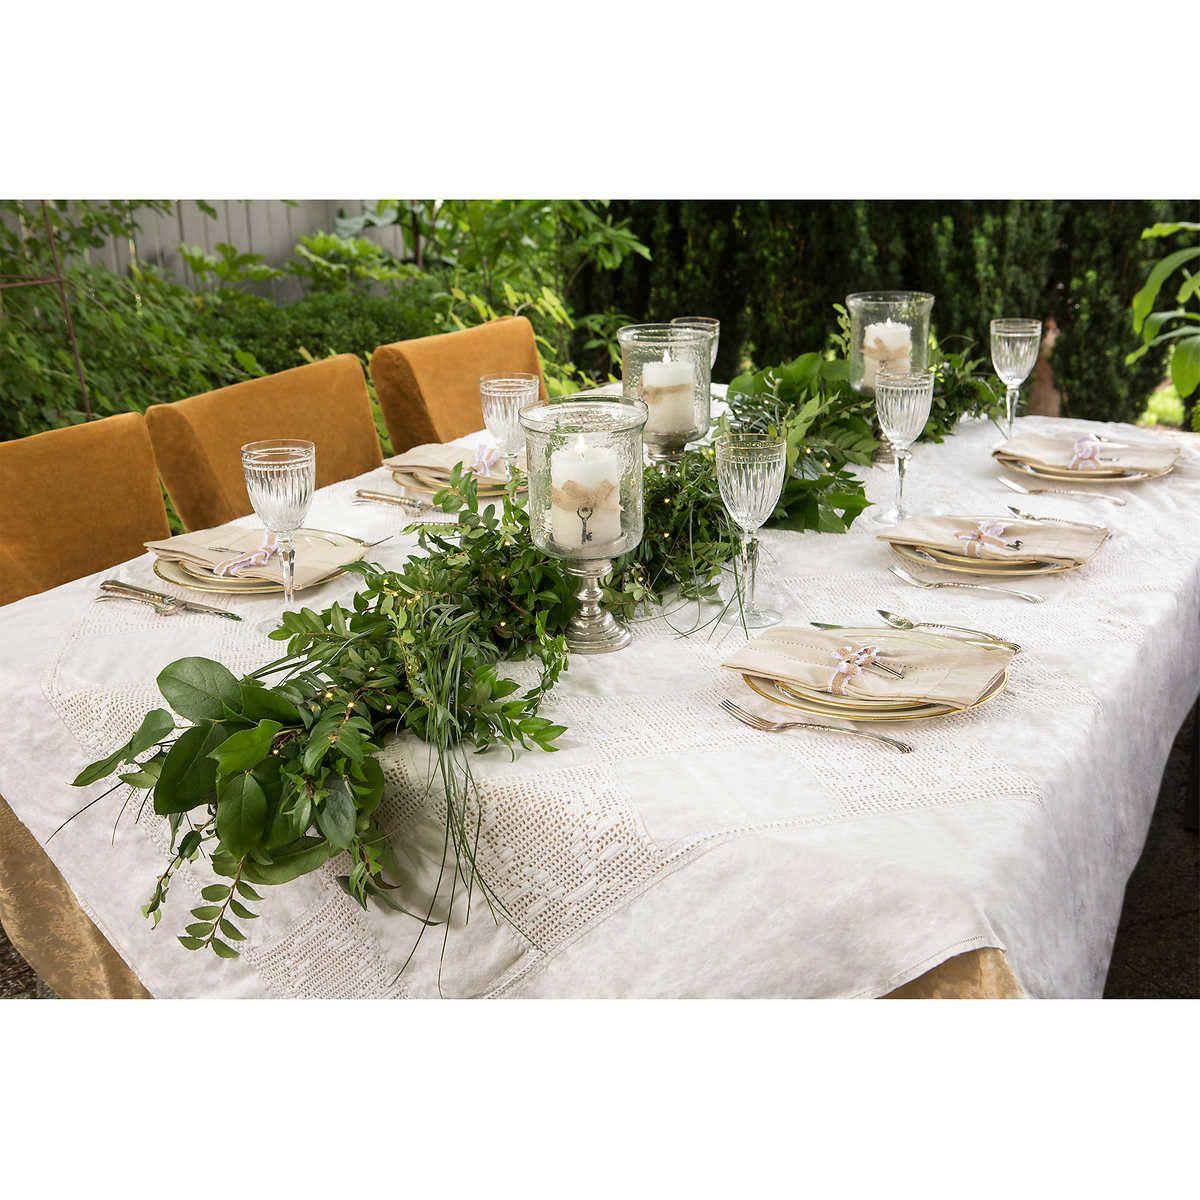 6 Wedding Runner 4 Pack In 2020 Wedding Runner Wedding Floral